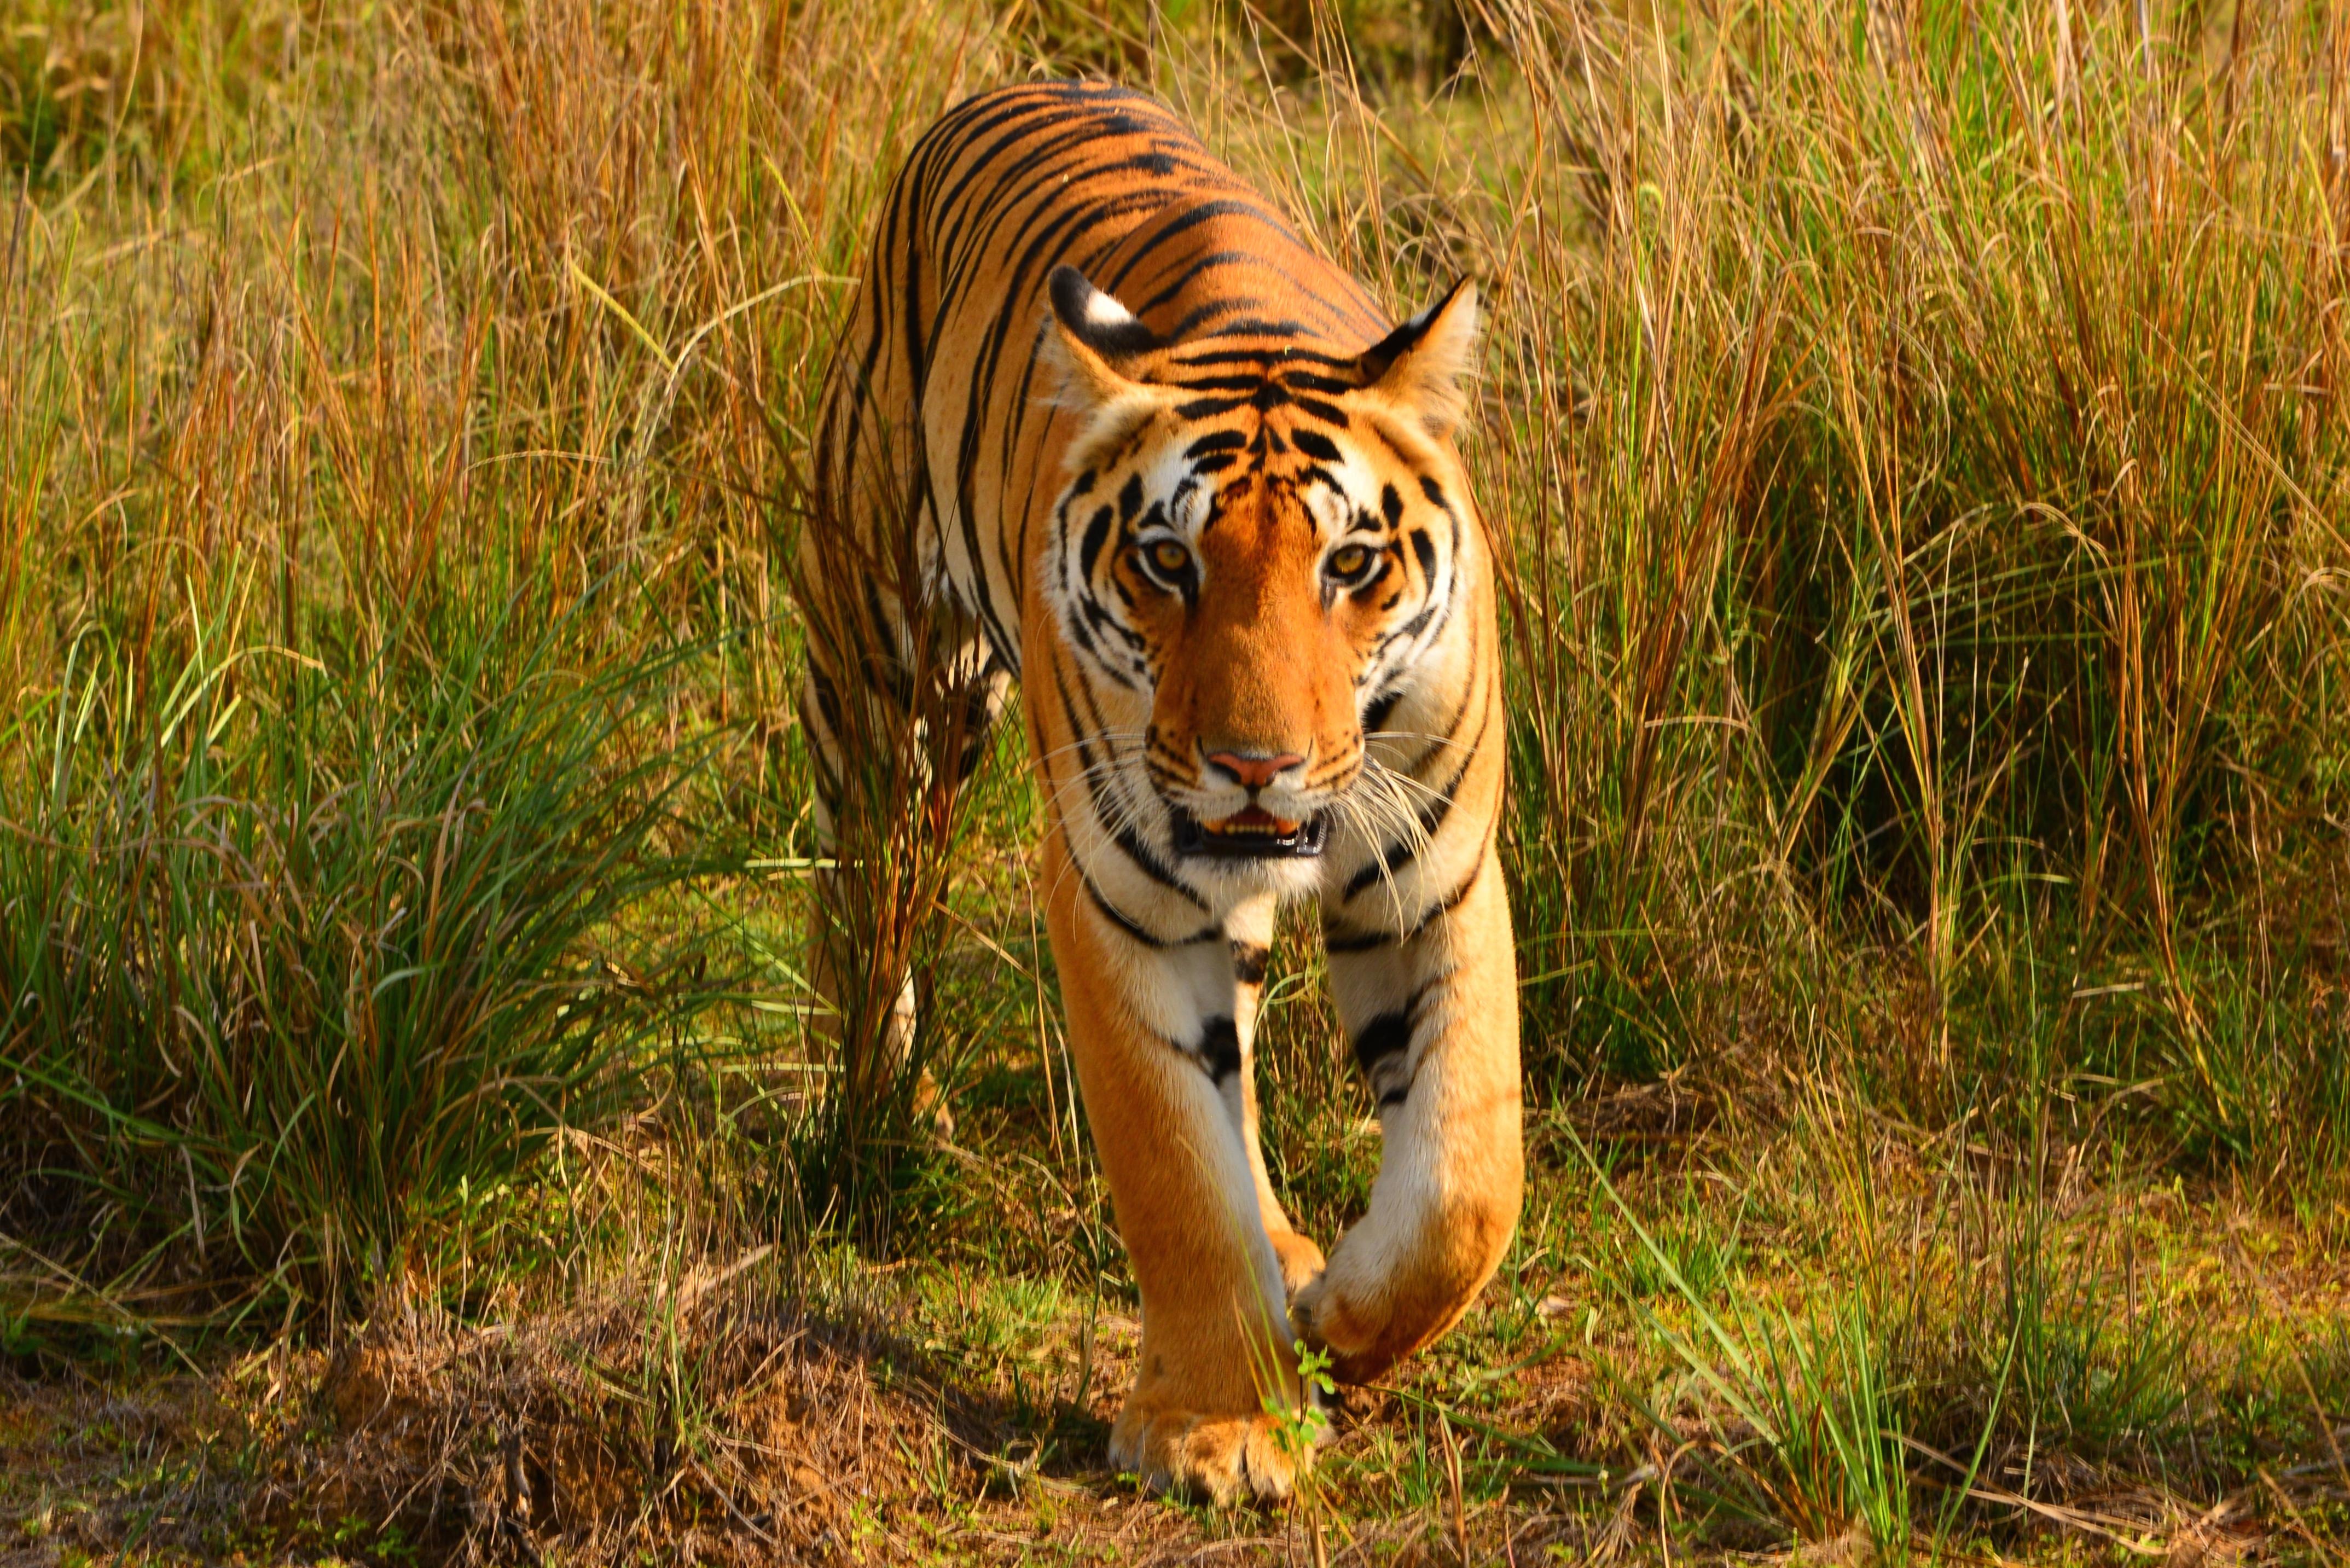 Bengal tiger. Photo: Jack Baucher